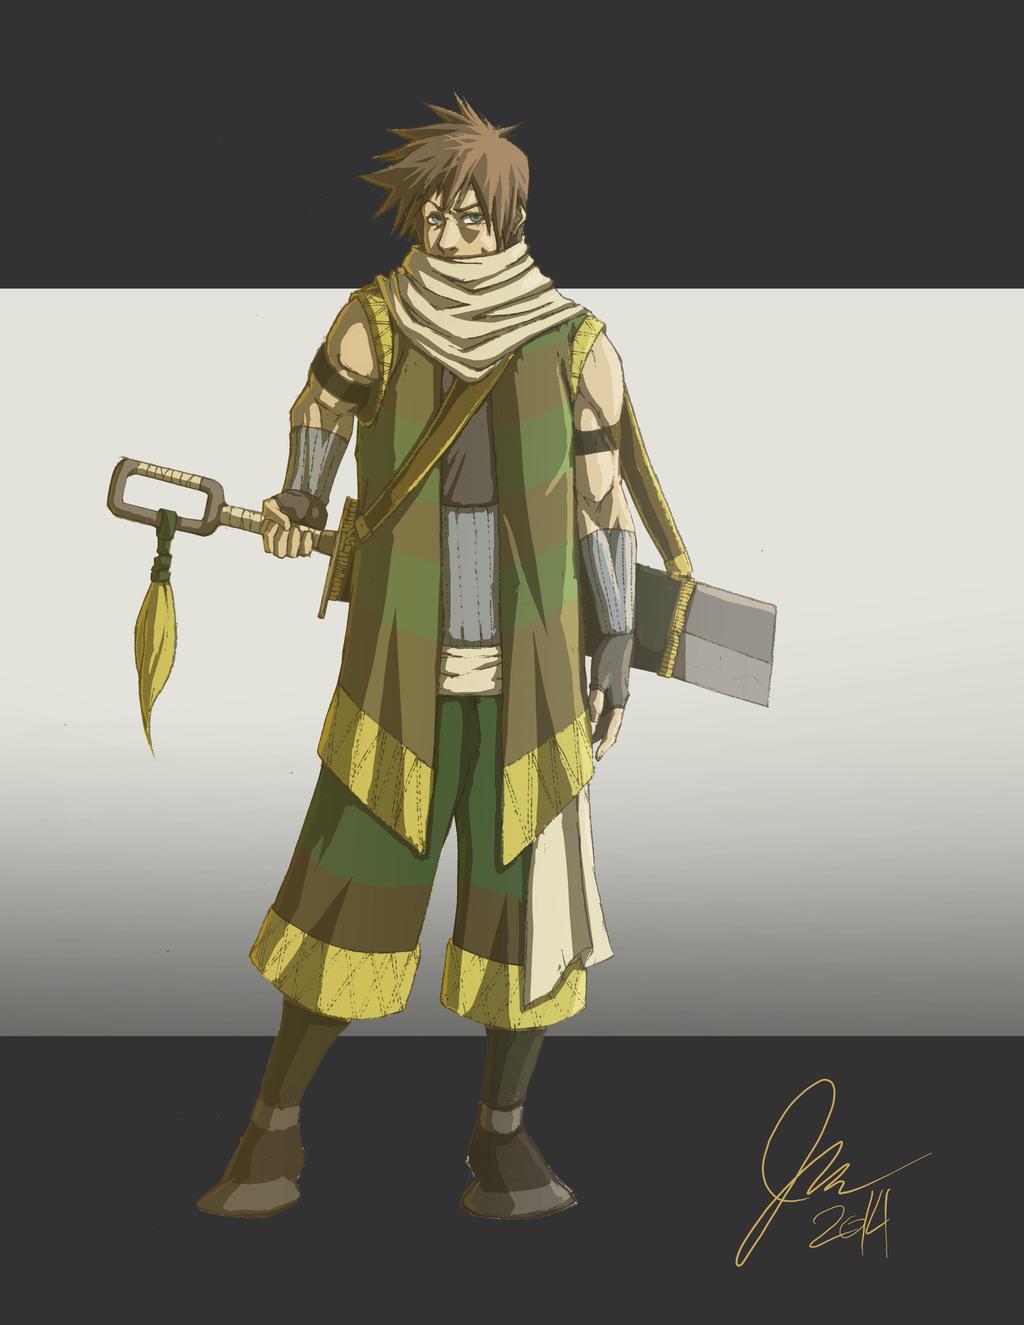 Character Design Ma : Character design by matinpatron on deviantart